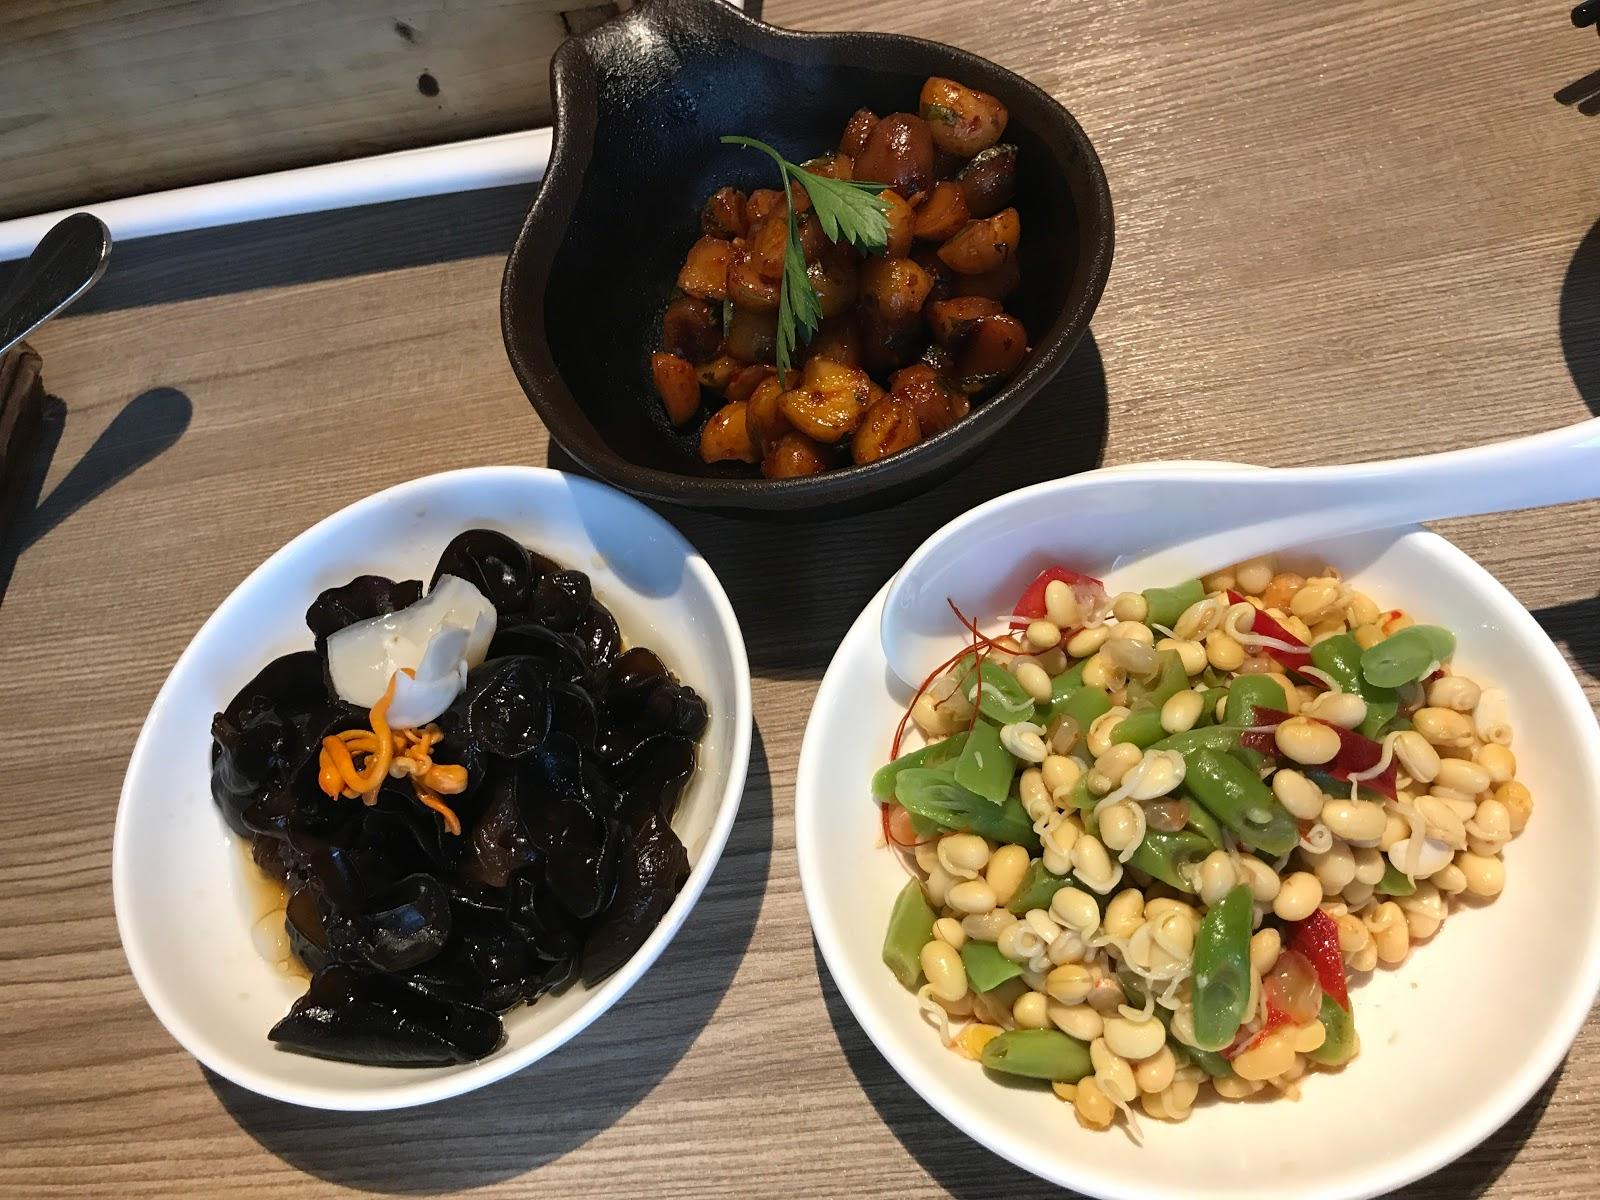 H&D幸福小屋: 高雄素食.漢來蔬食-巨蛋店